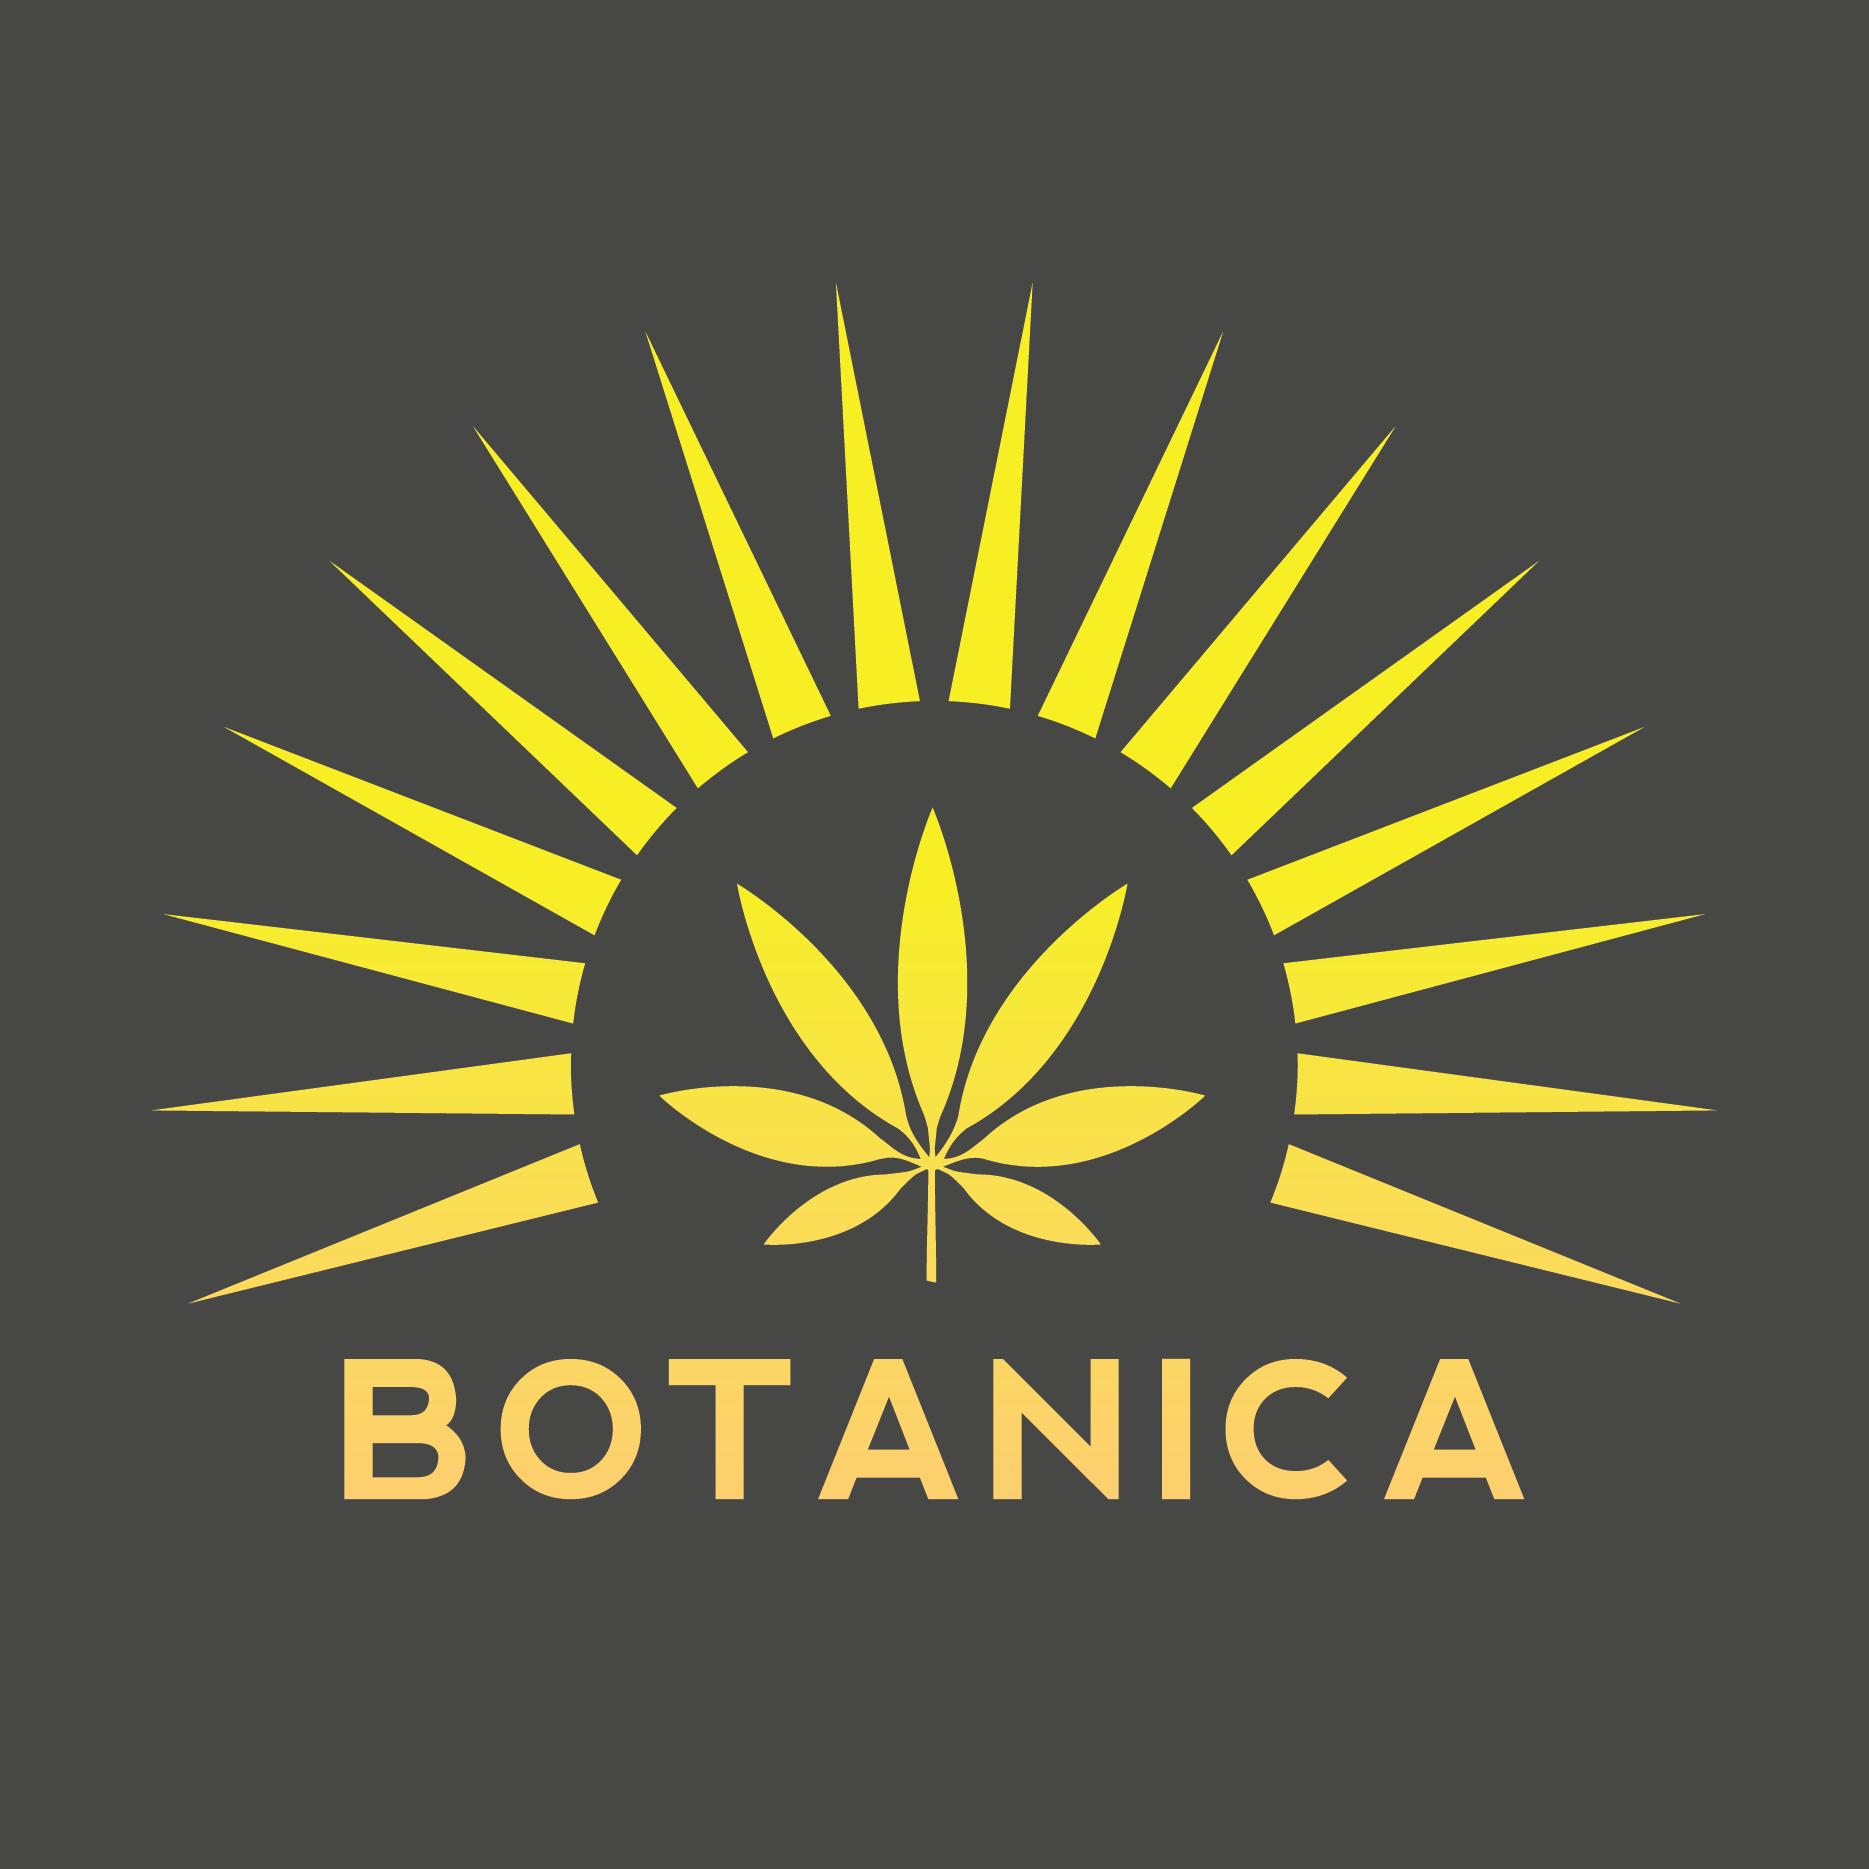 Botanica (SE 12th Ave)